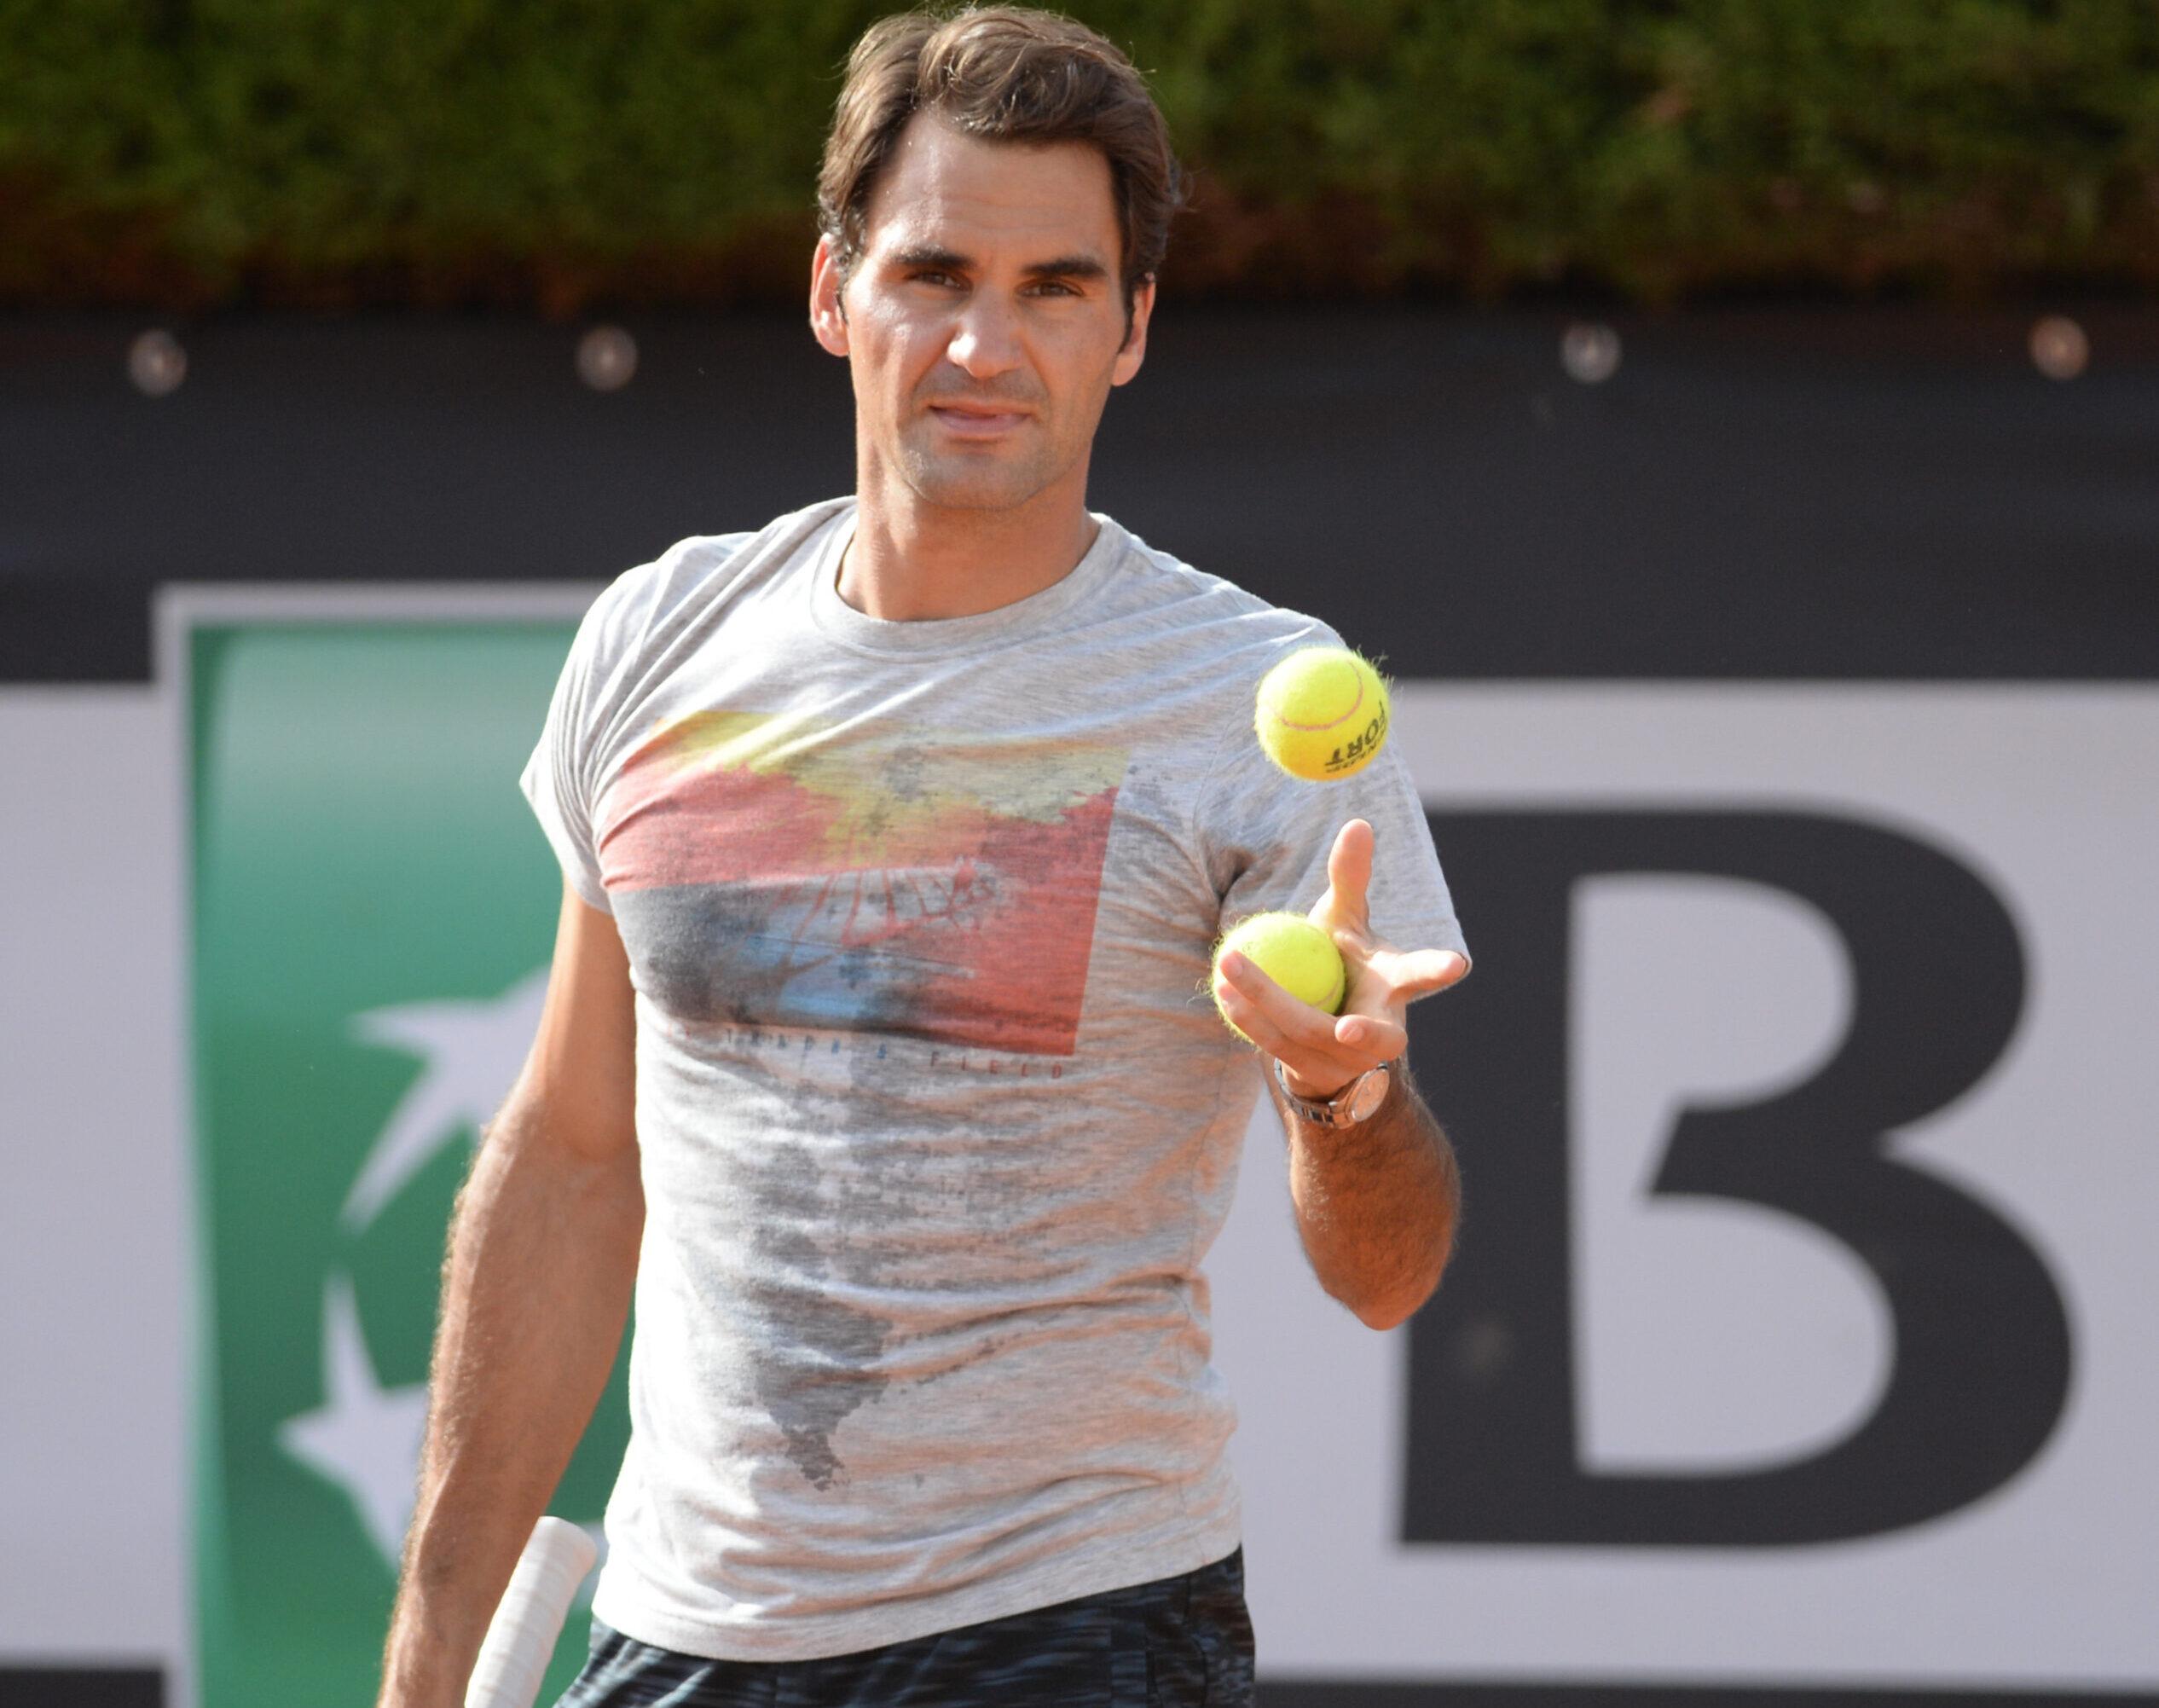 Roger Federer's Workout Routine